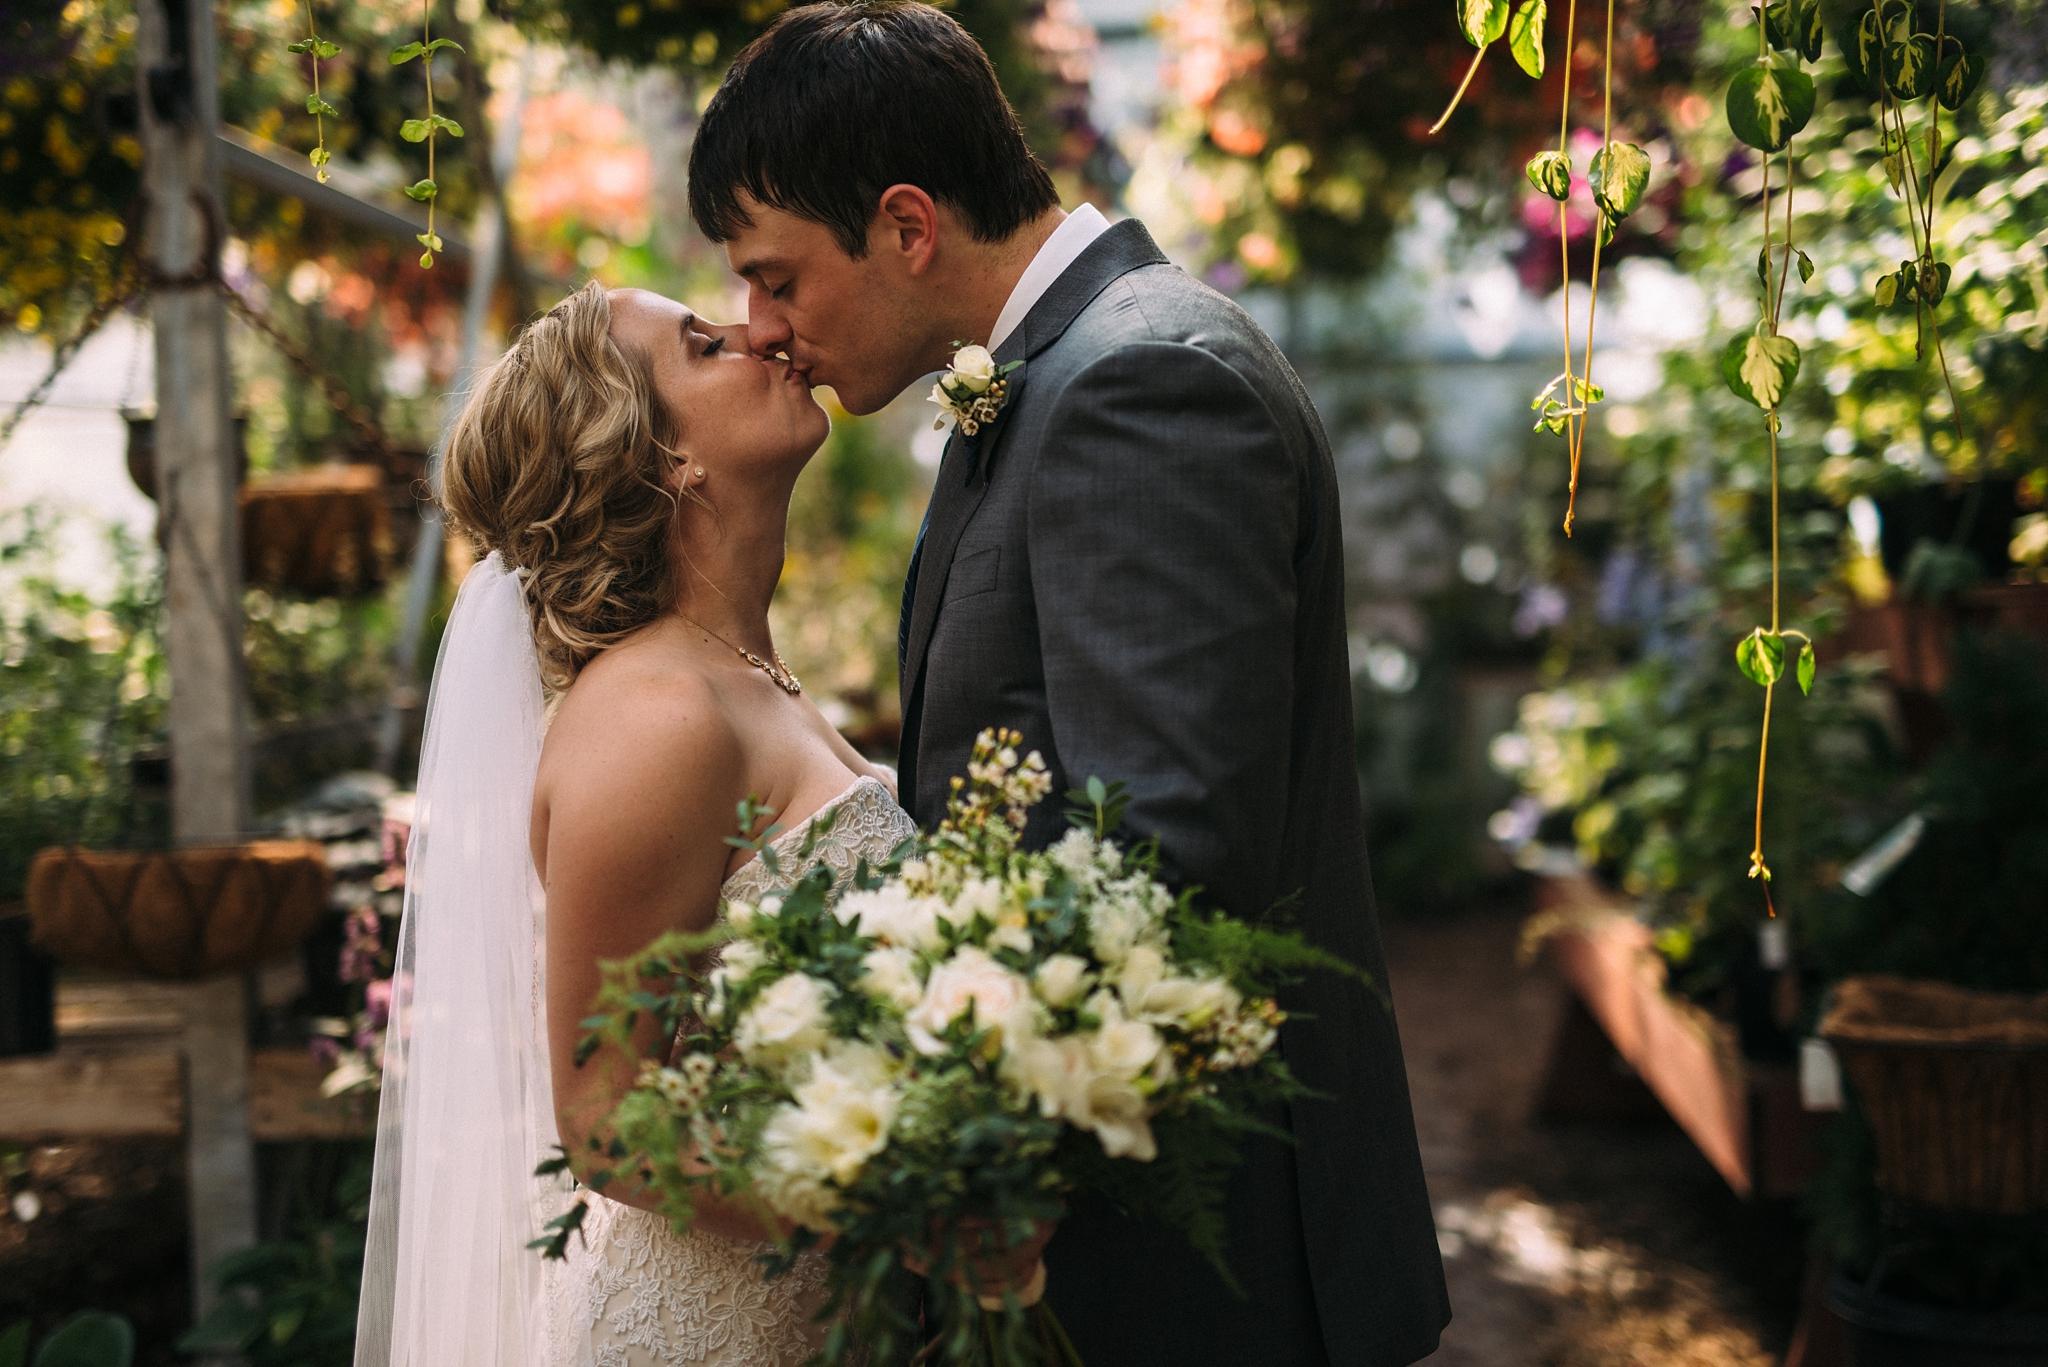 kaihla_tonai_intimate_wedding_elopement_photographer_4326